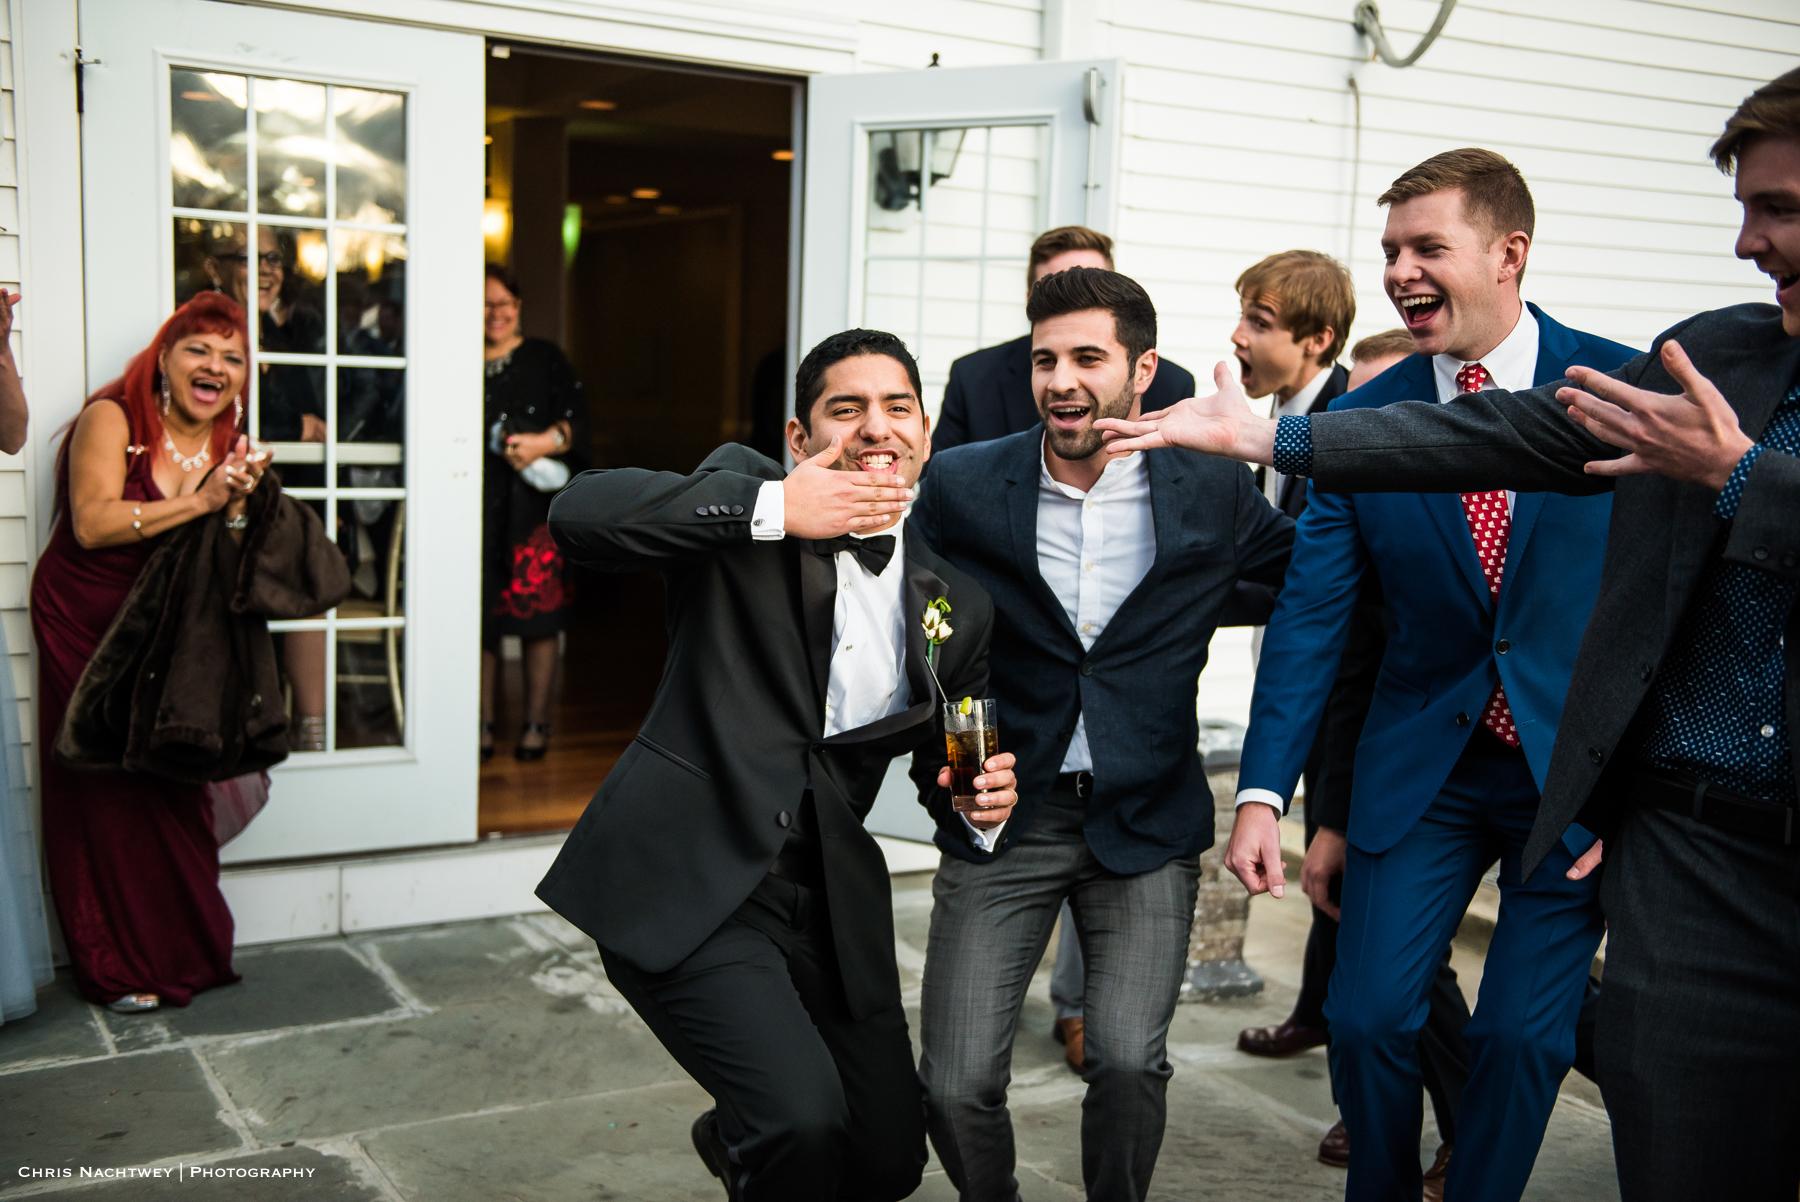 wedding-the-litchfield-inn-ct-photos-chris-nachtwey-photography-2018-43.jpg